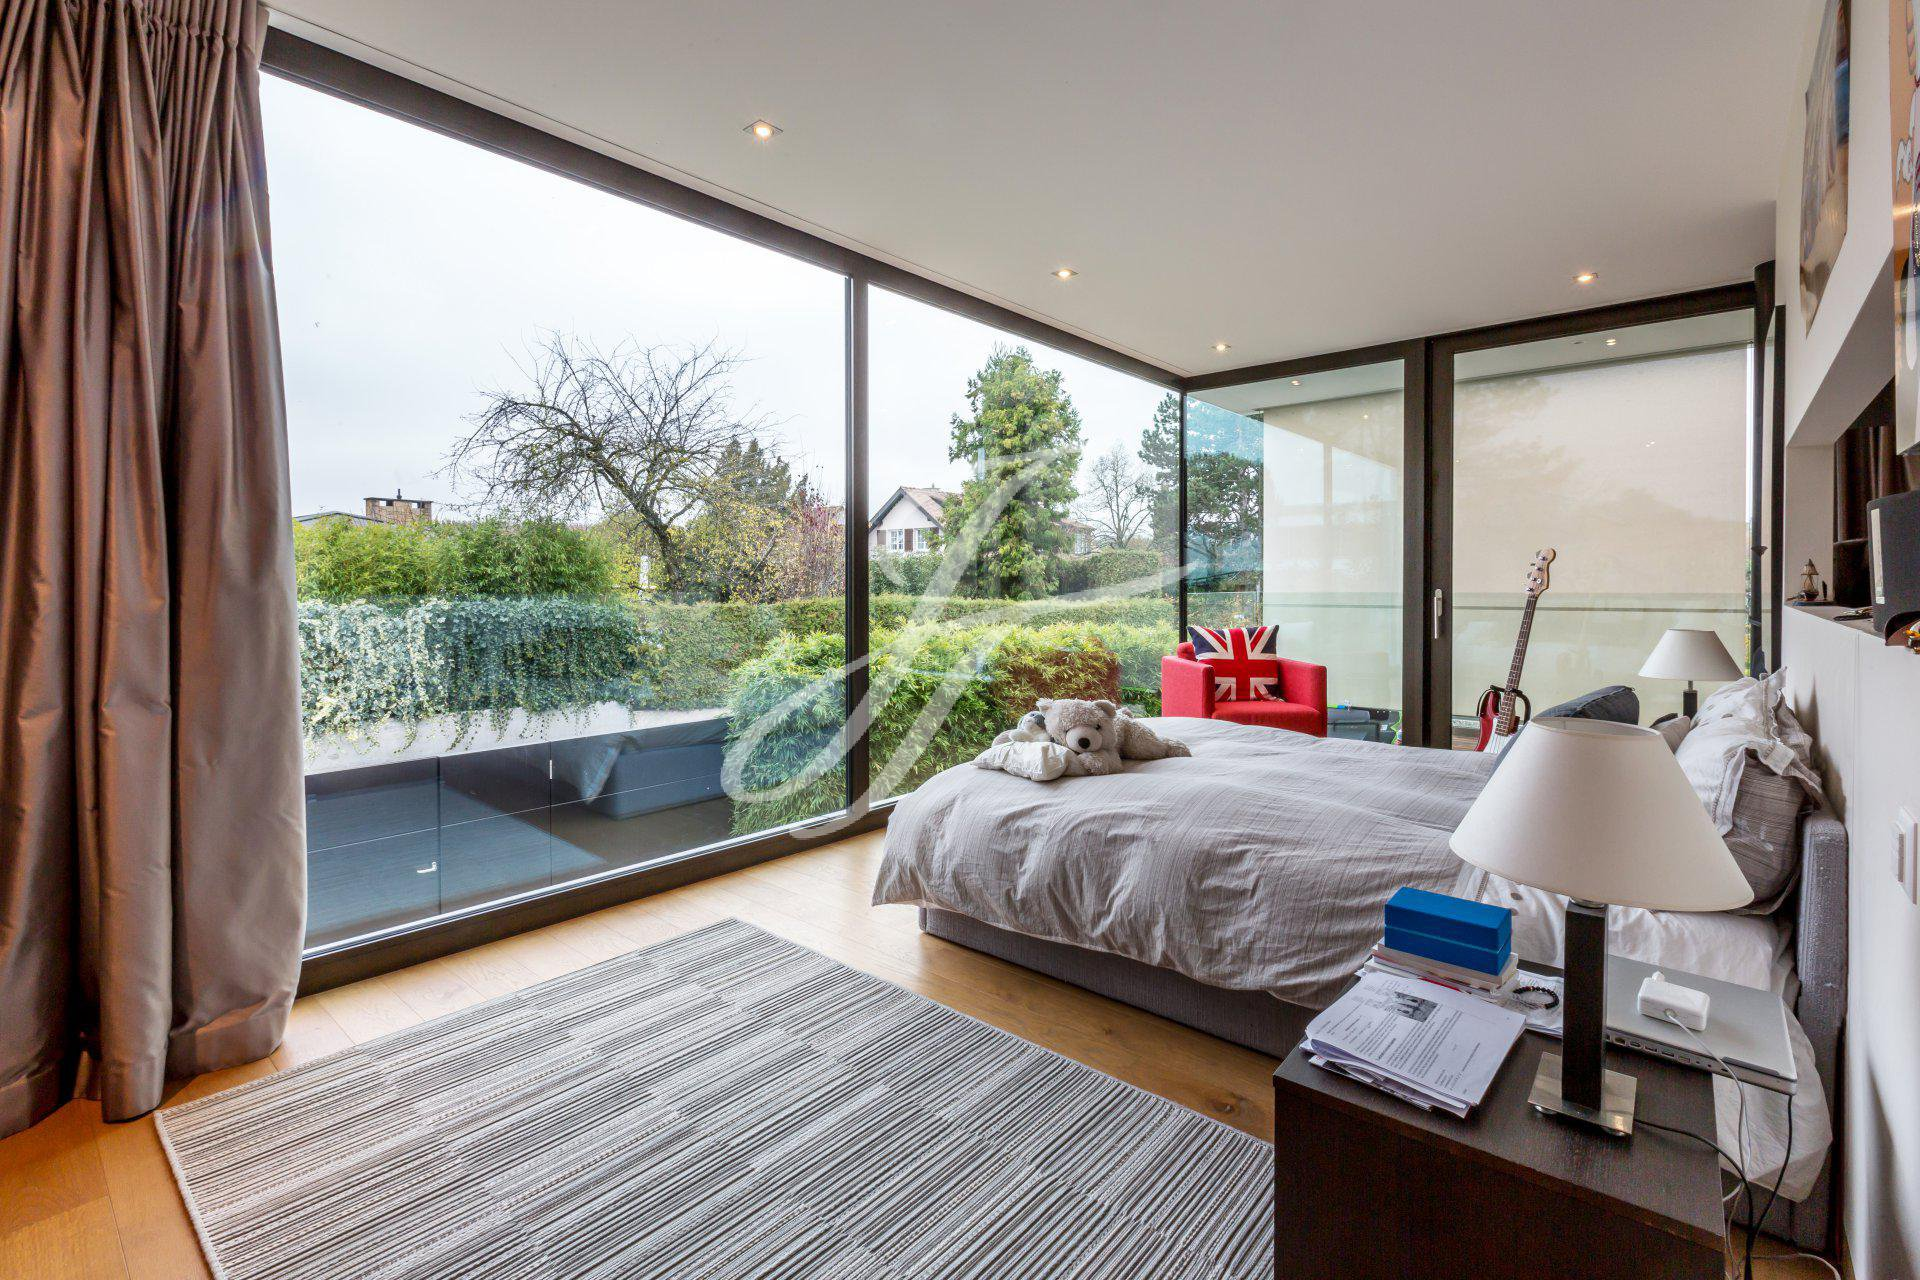 Luxury villa for sale in Anières, Switzerland |FINEST RESIDENCES